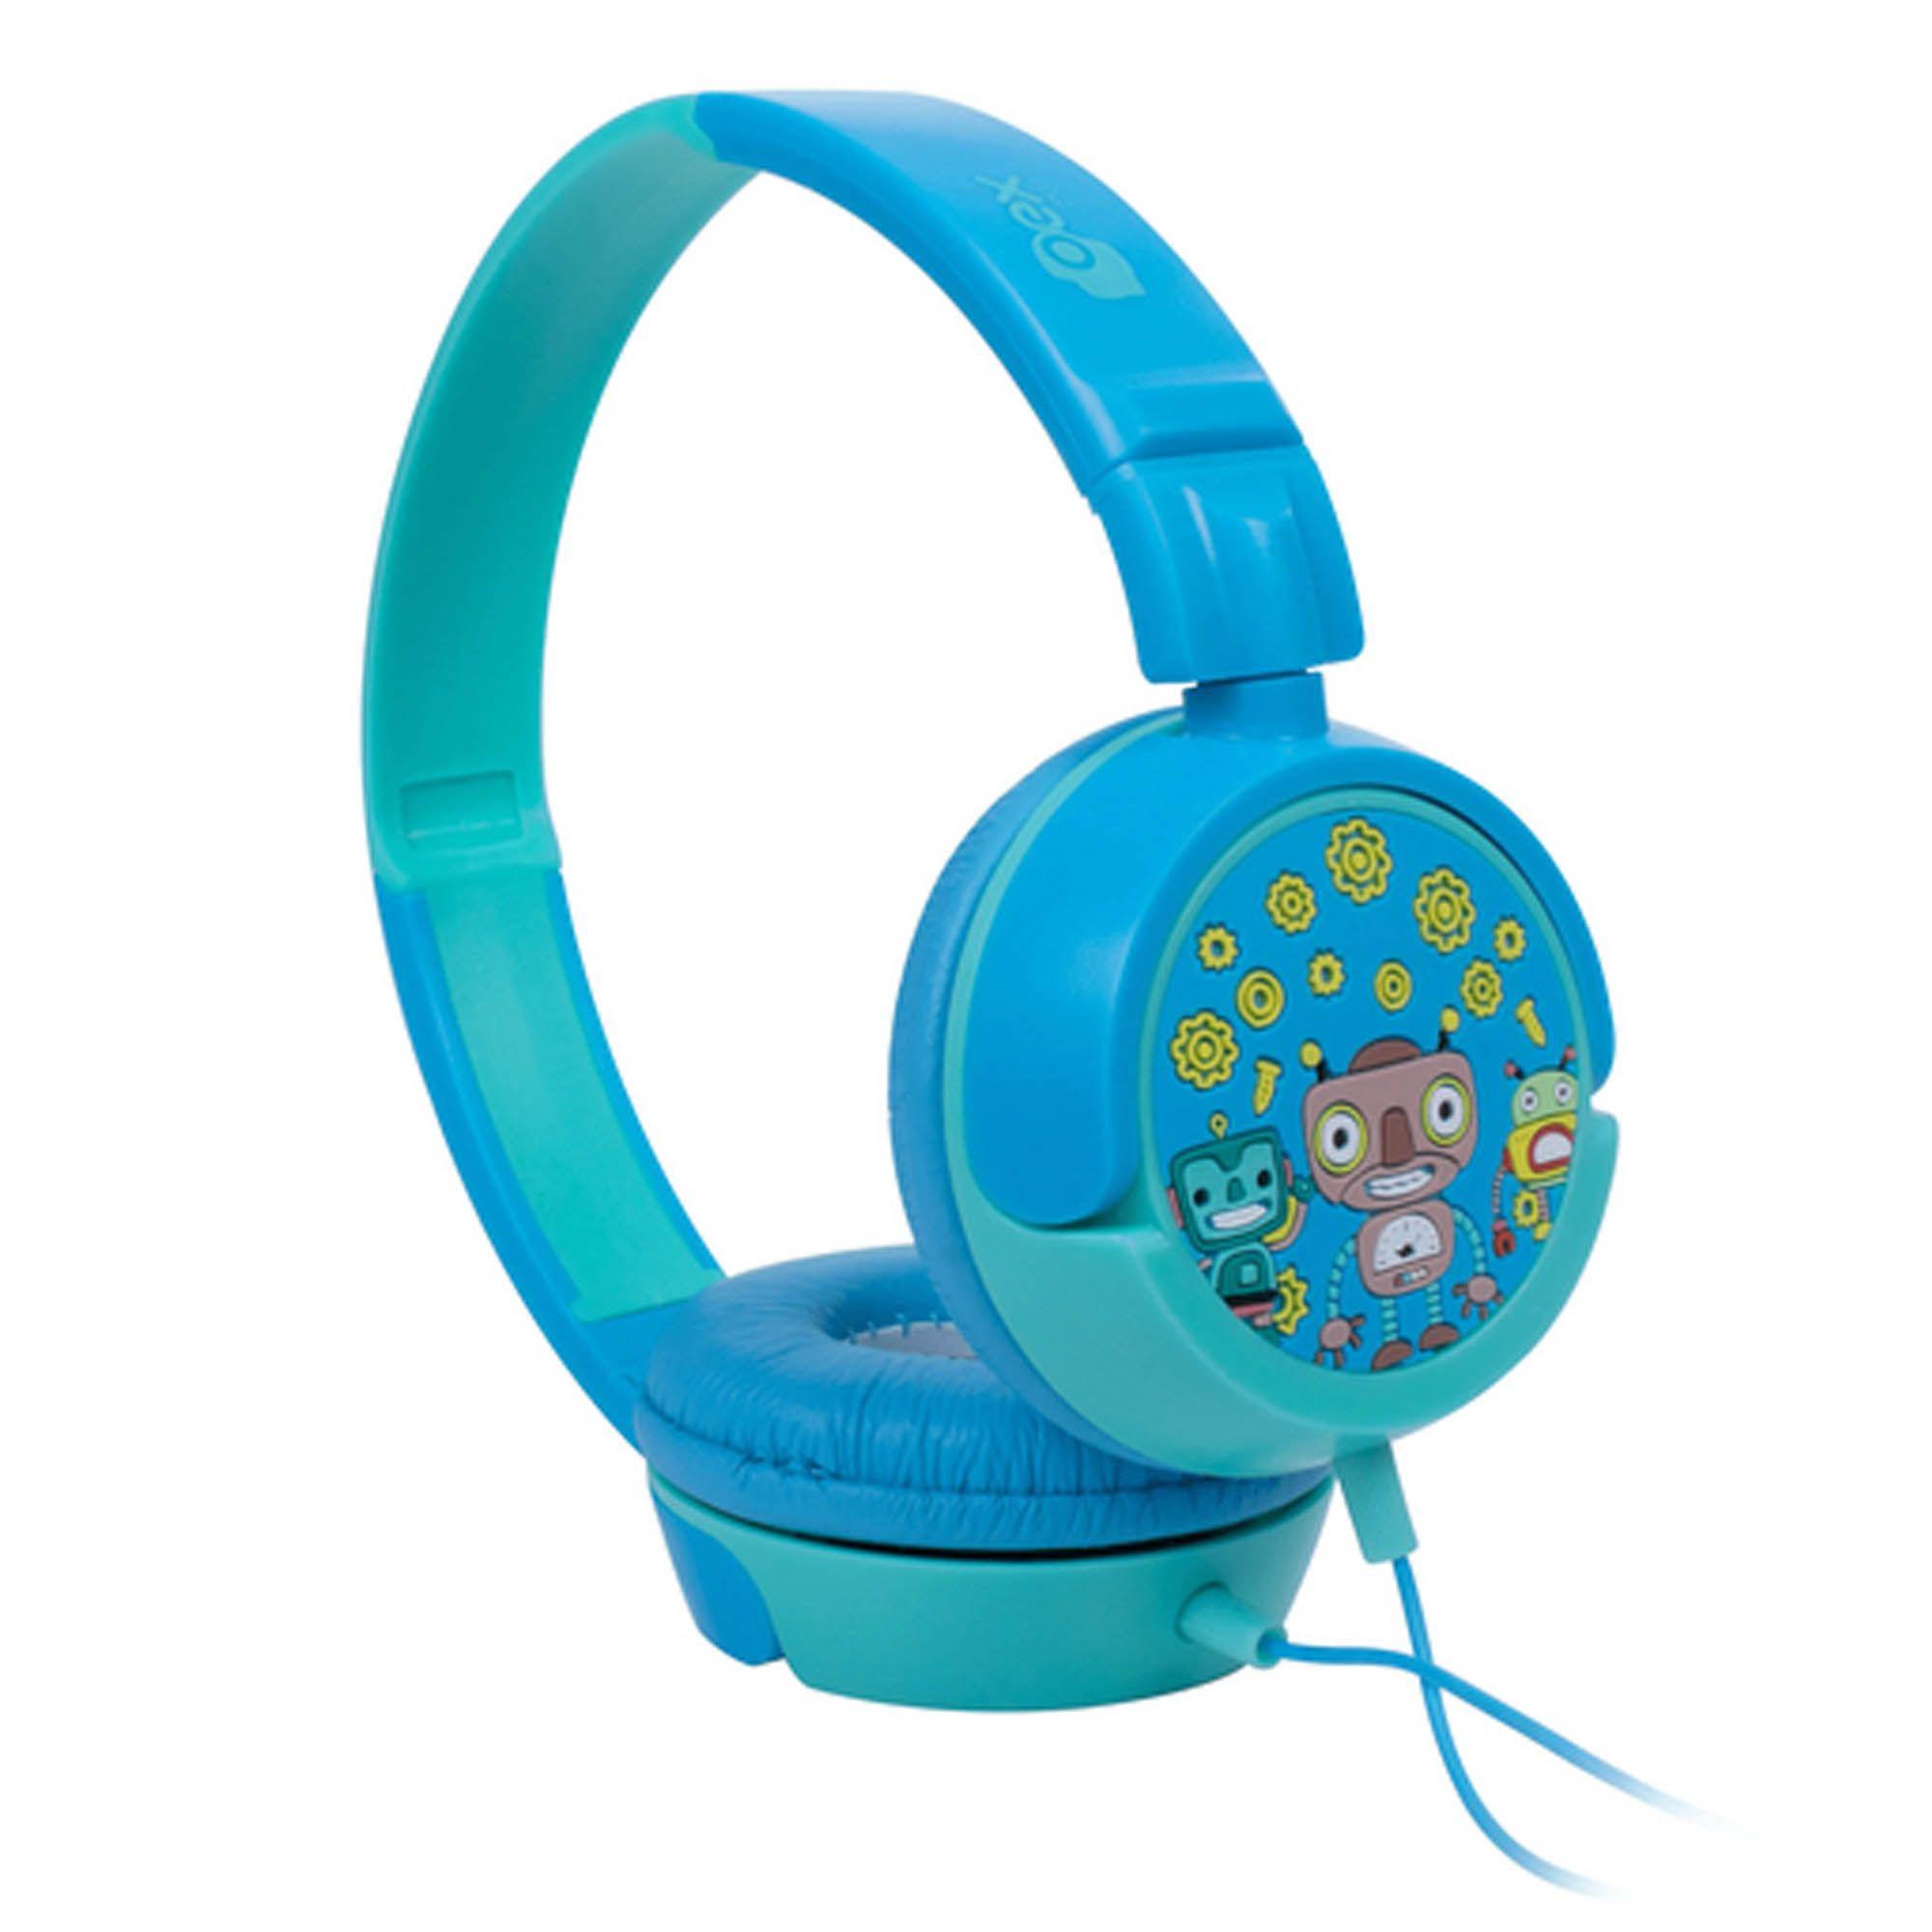 HeadPhone Infantil Oex Giratório KIDS Robos Azul - HP305